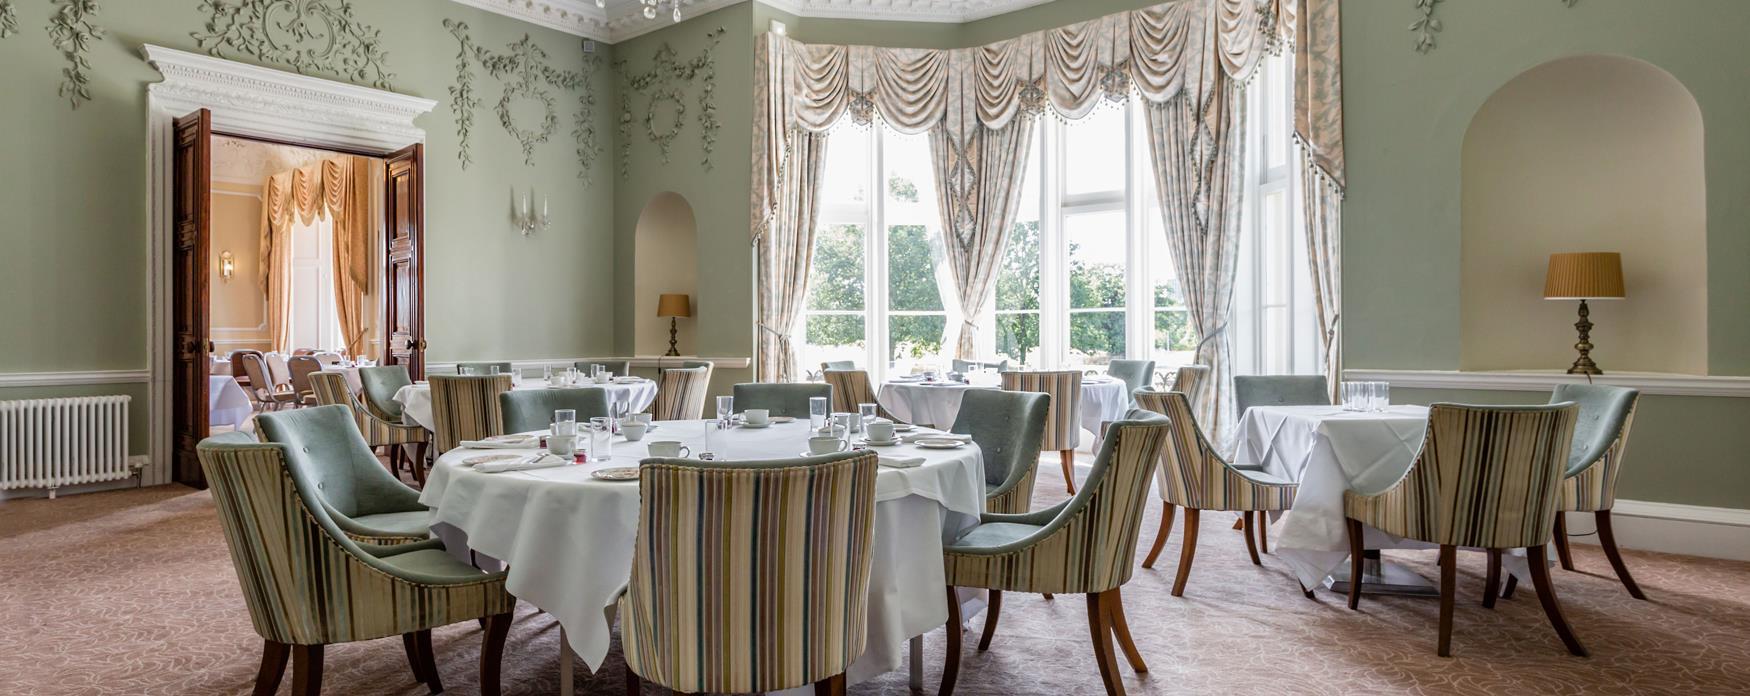 Wivenhoe House restaurant interior